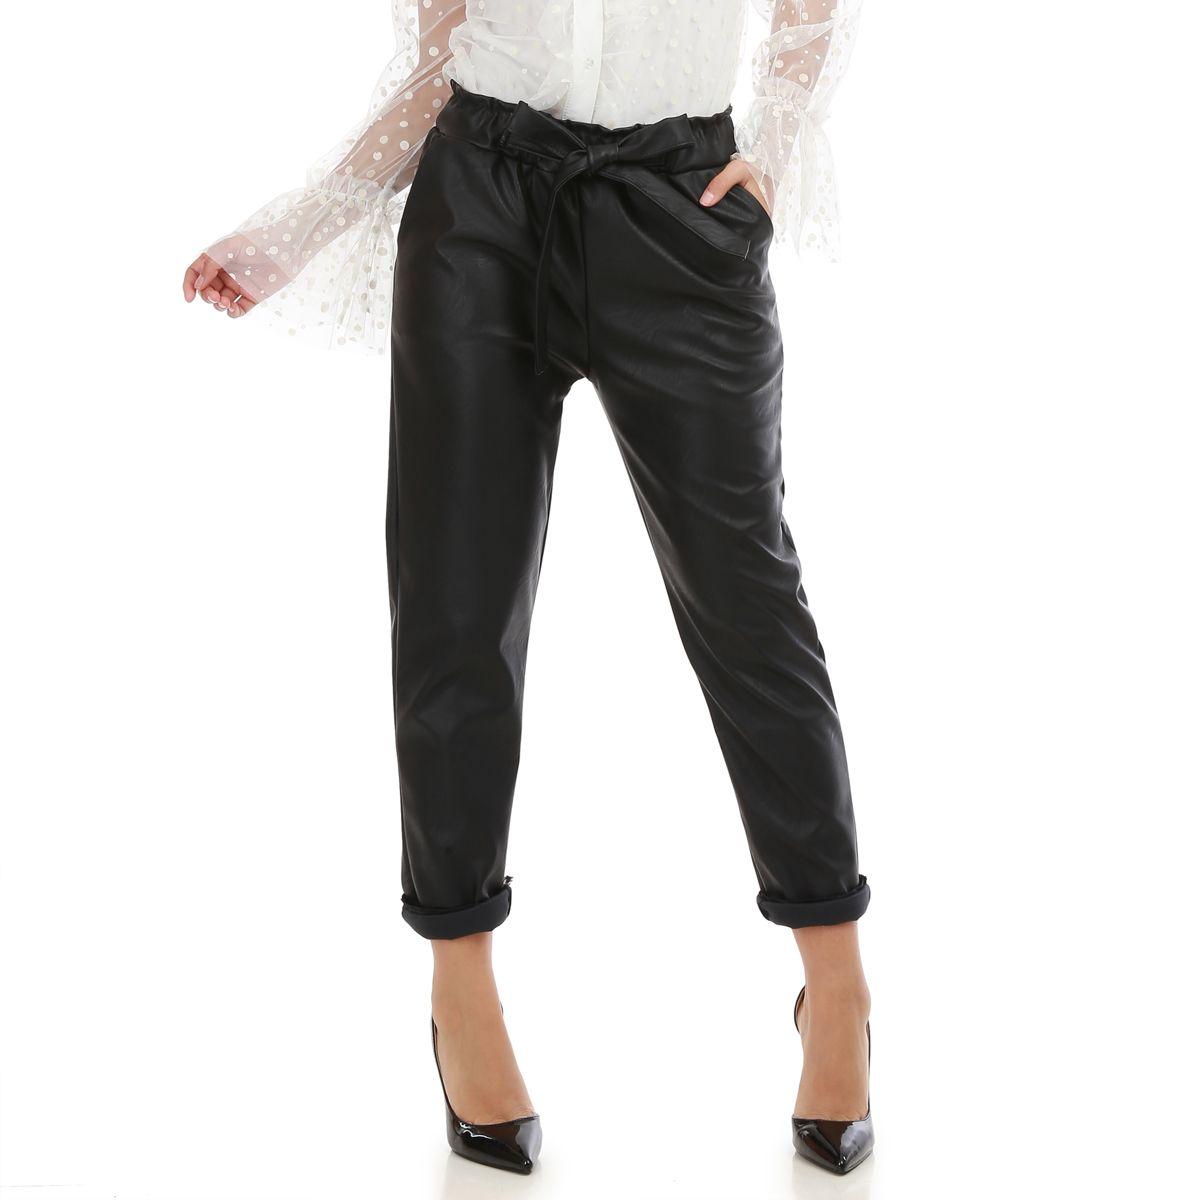 pantalon noir pas cher